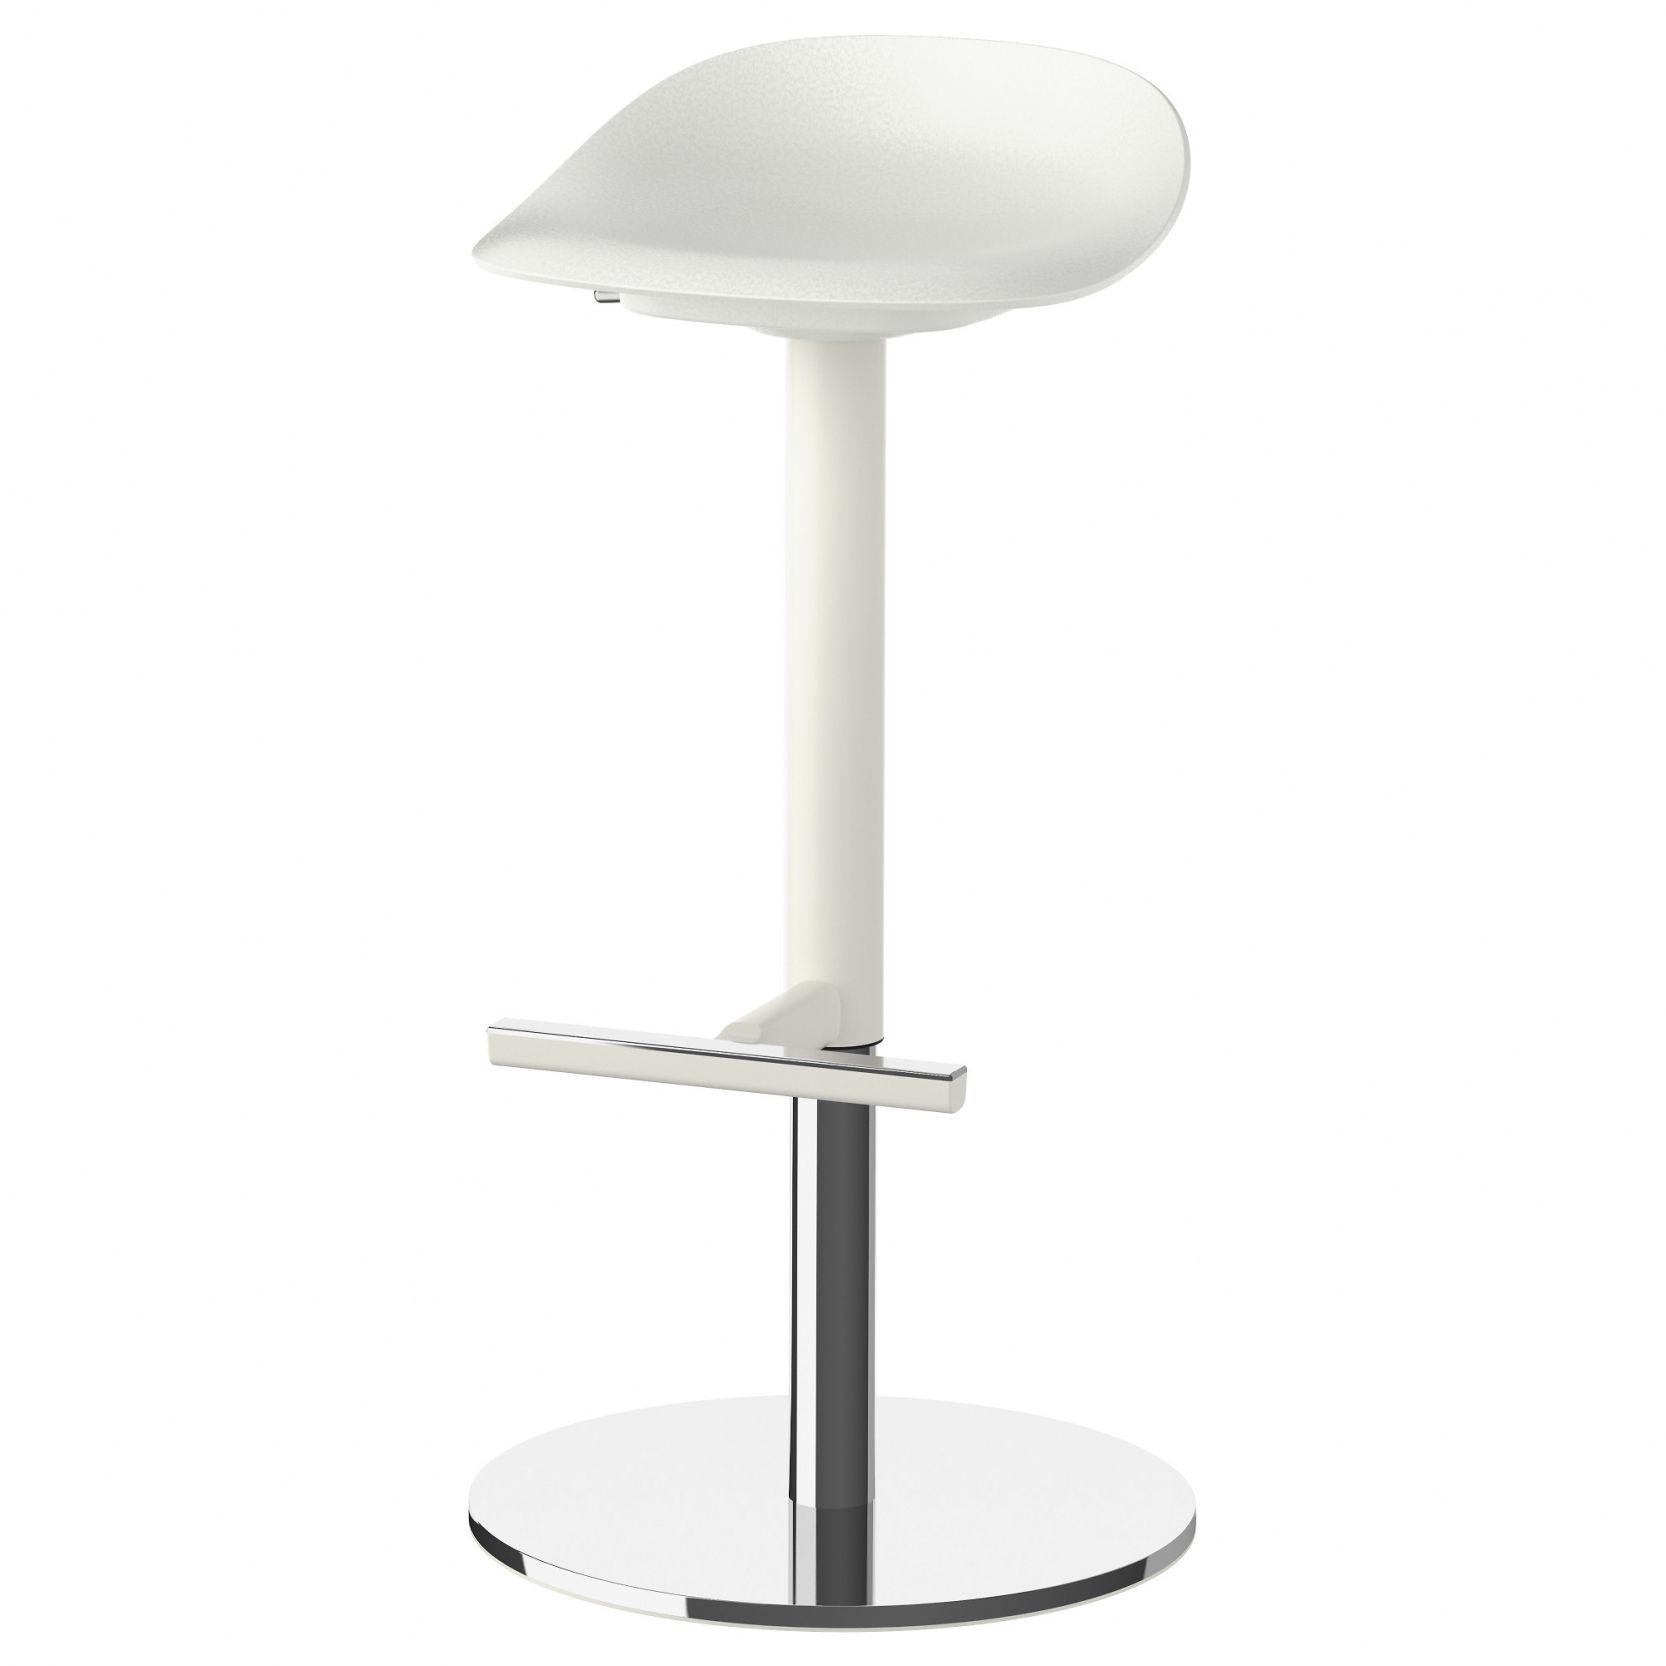 3ed6414a25f50fb9543c3b864b20a75b Frais De Bar De Salon Ikea Concept